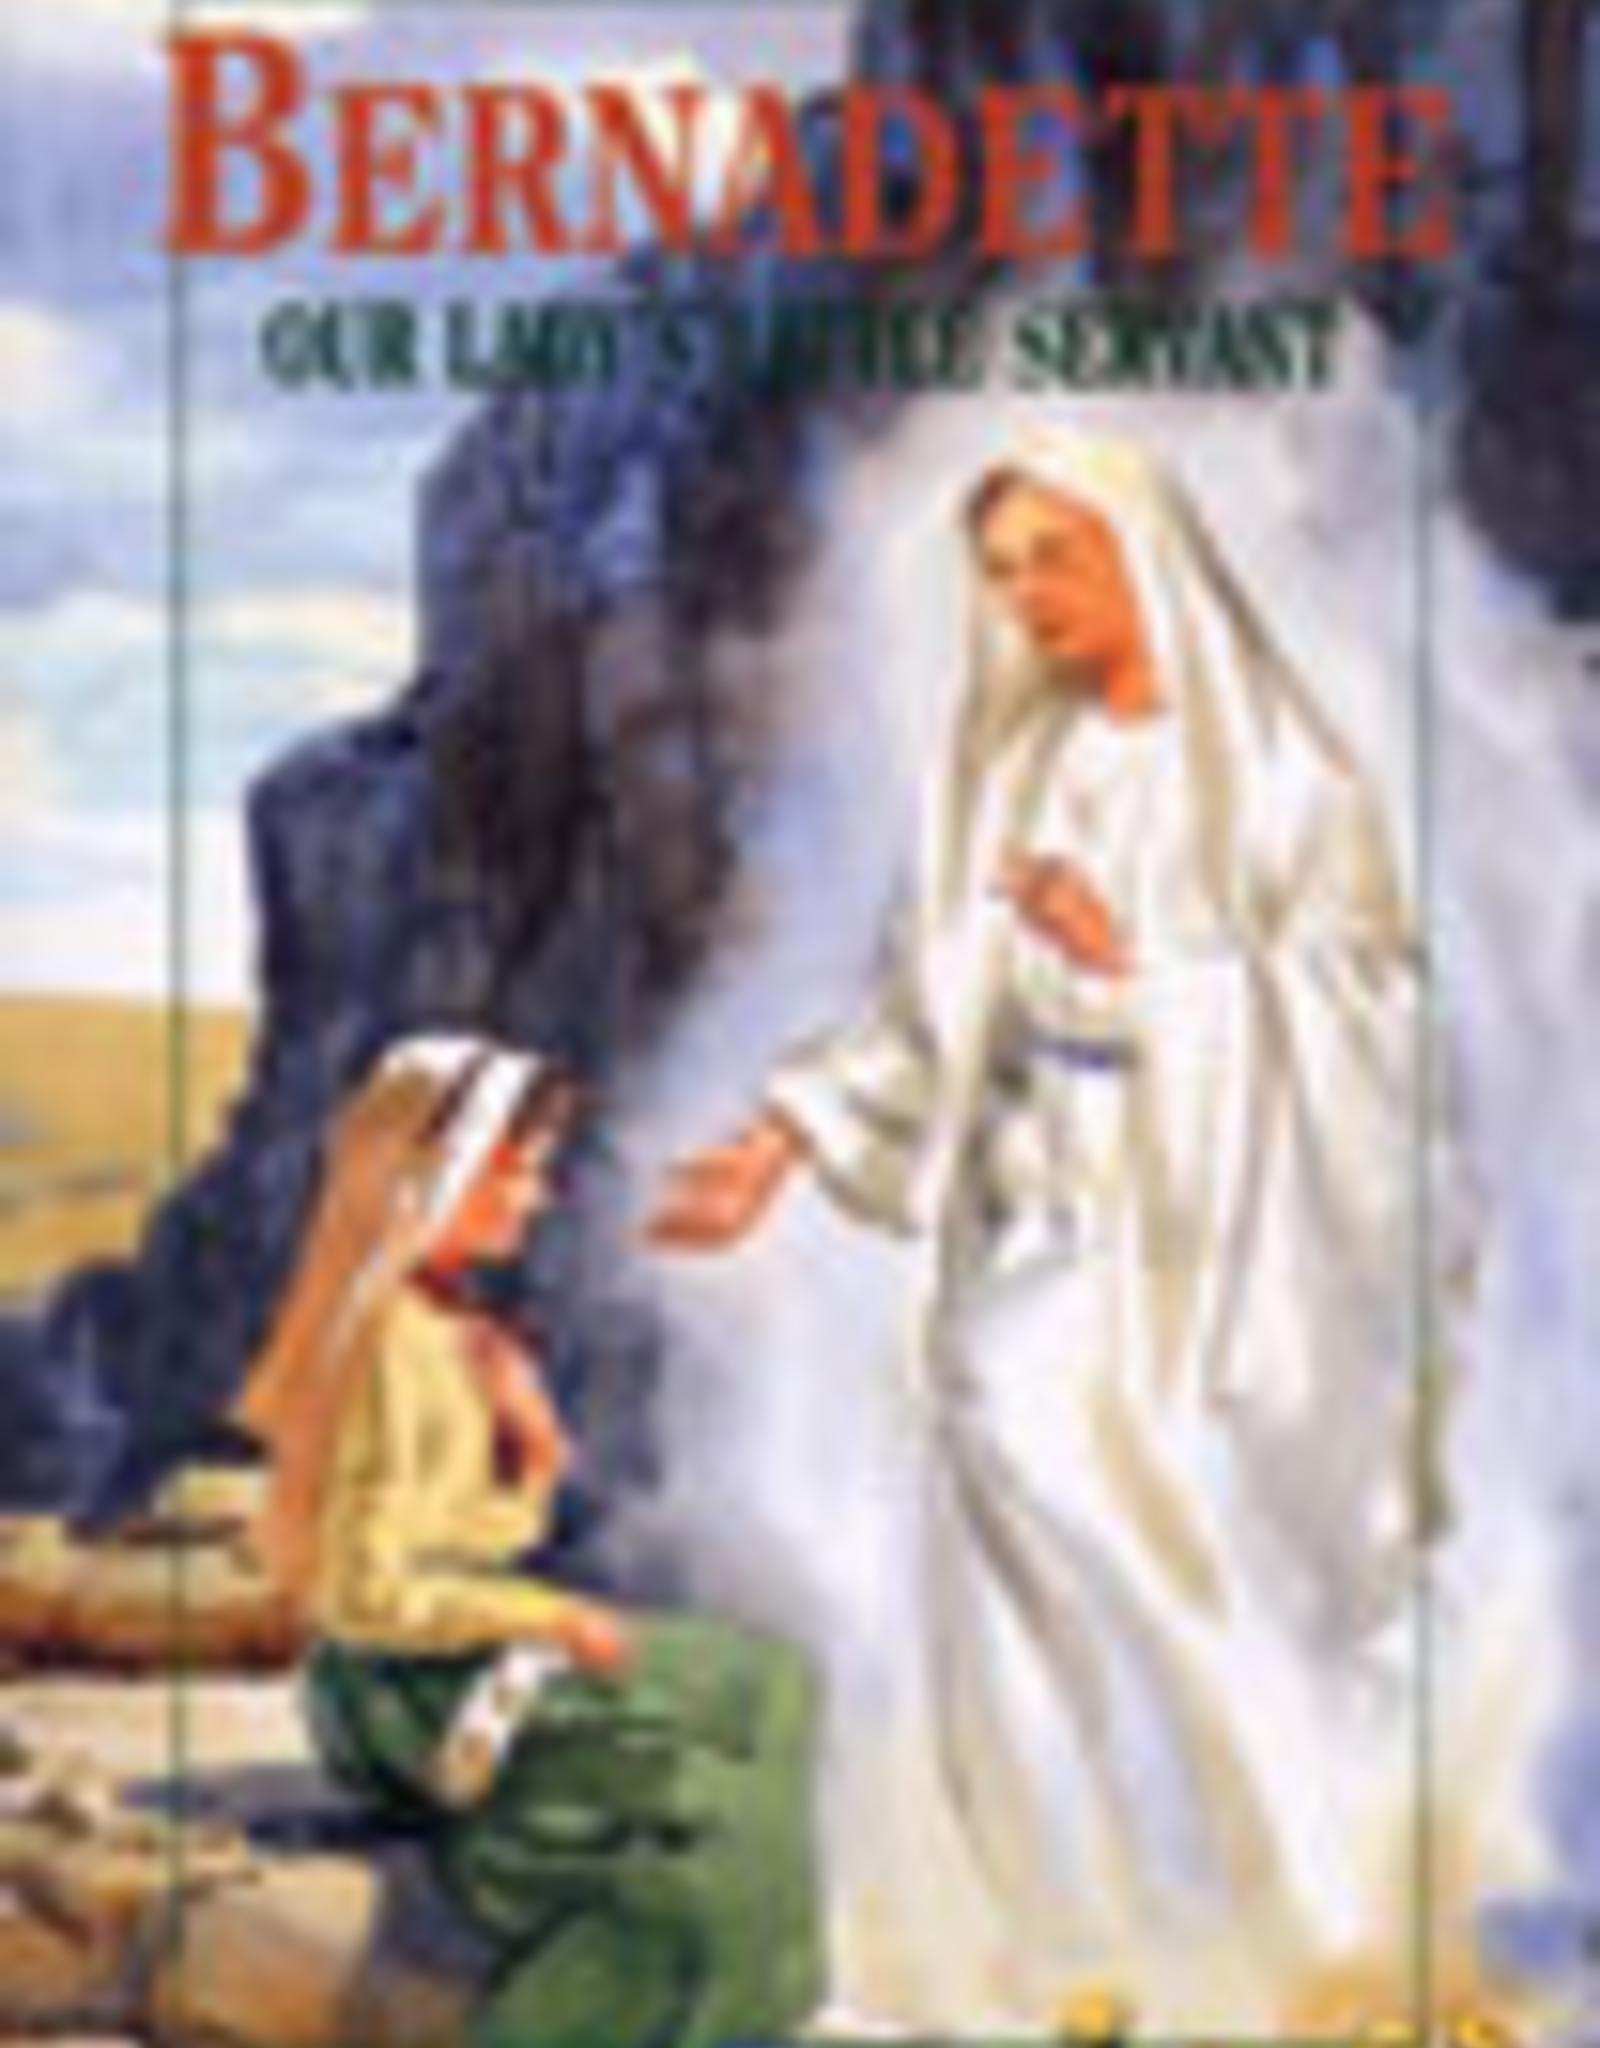 Ignatius Press Bernadette, Our Lady's Litle Servant, by Hertha Pauli ( paperback)